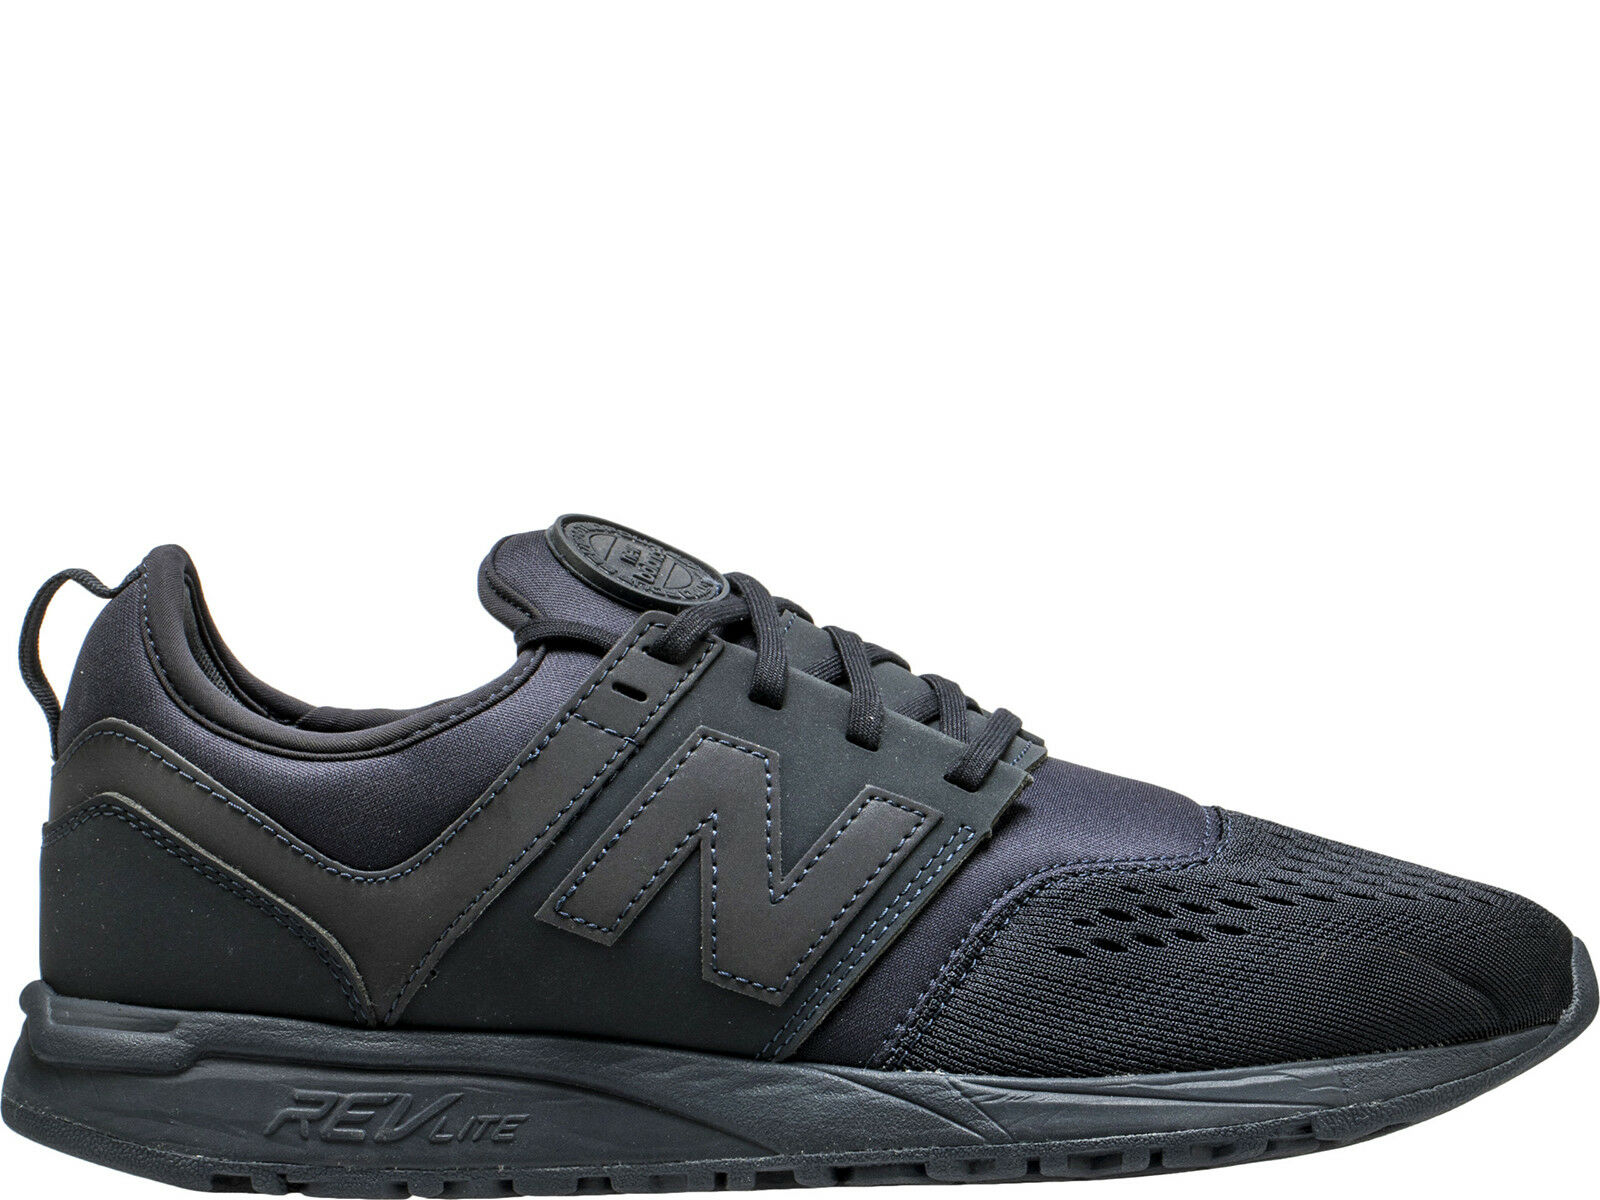 Men's Brand New New Balance Lifestyle Mode DE VIE Athletic Sneakers [MRL247B0]